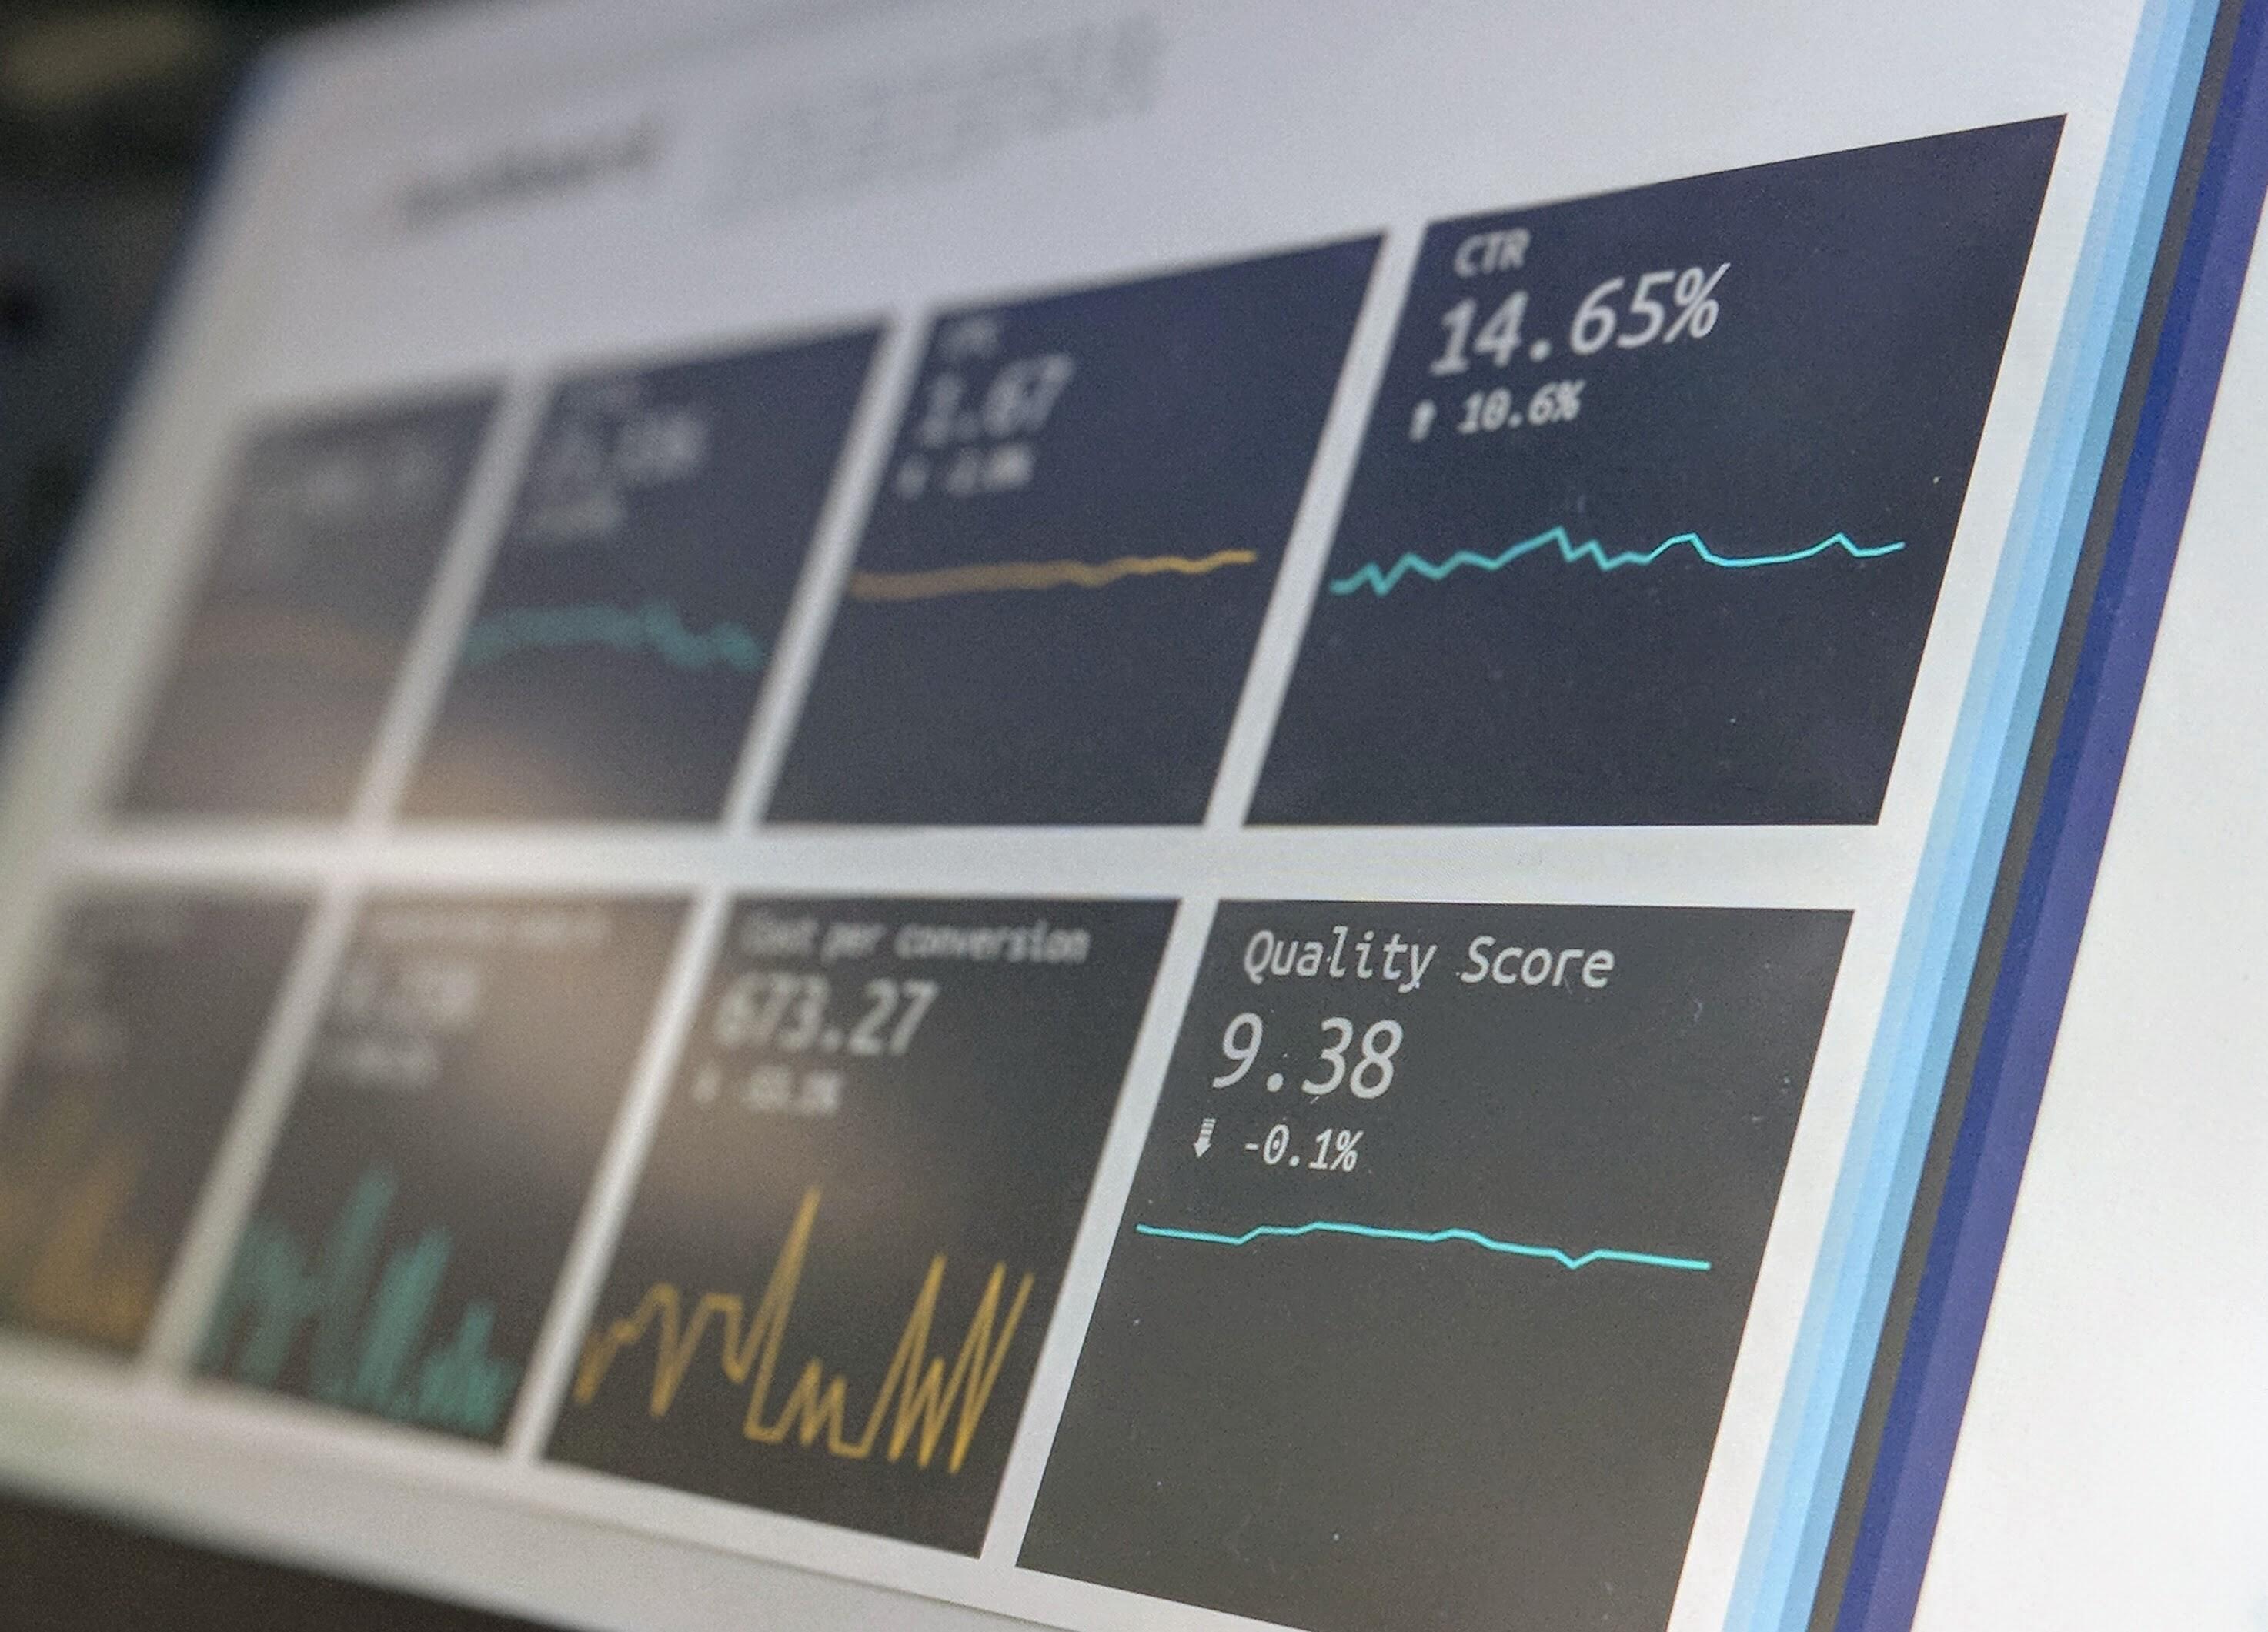 Cloud artificial intelligence startup Akkio raises $3M from Bain Capital - SiliconANGLE